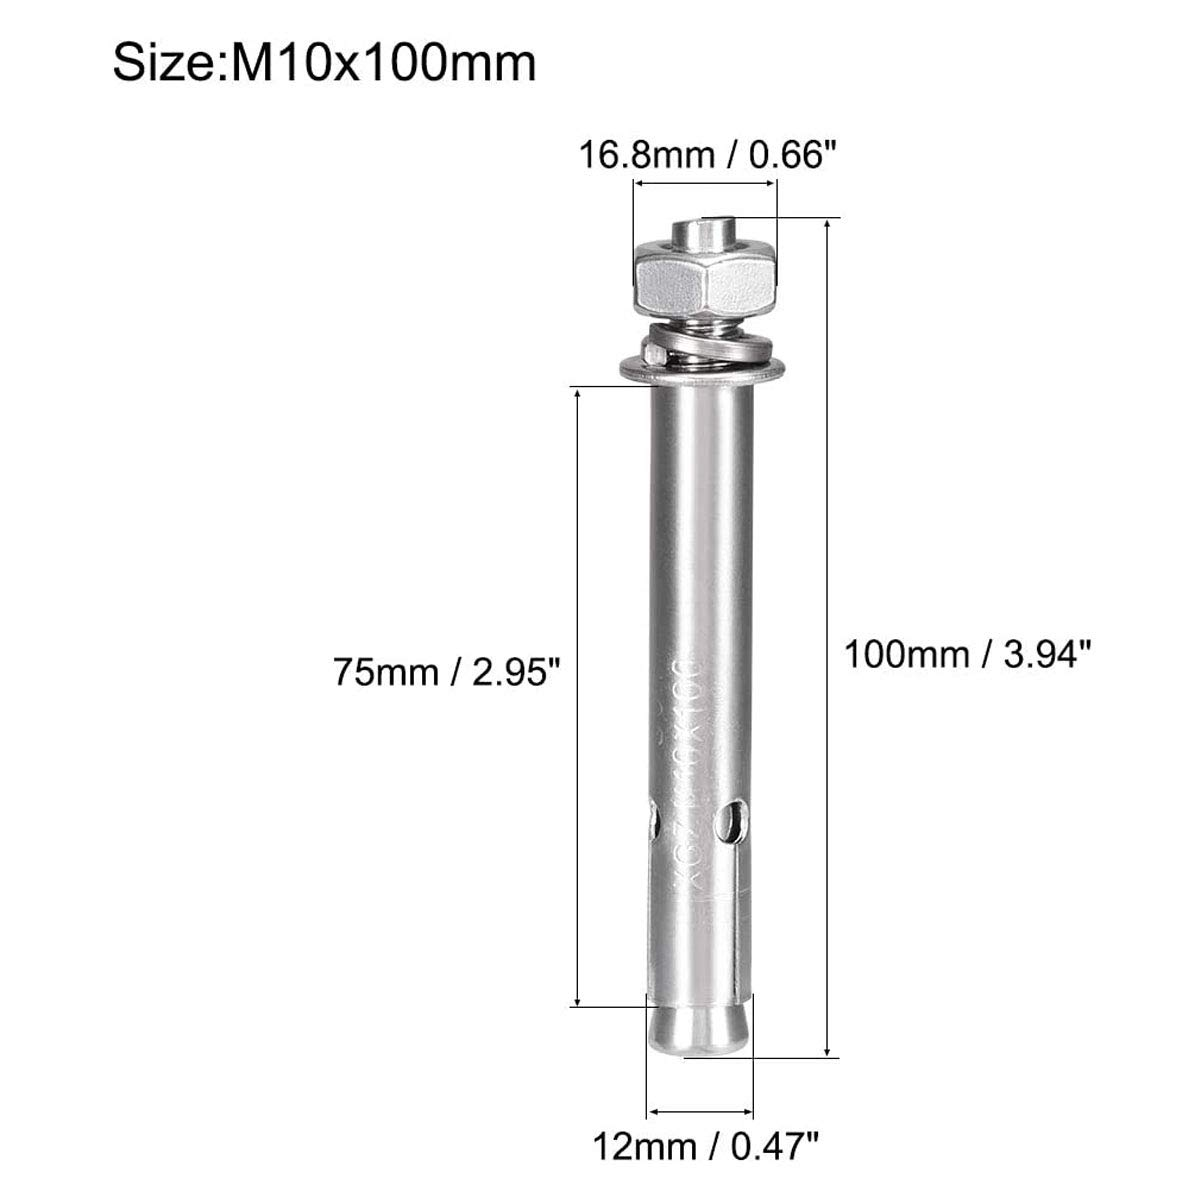 3 Pcs L-A M10x70 304 Stainless Steel External Hex Expansion Bolt Screw Sleeve Anchor Expansion Screw Bolt Burst